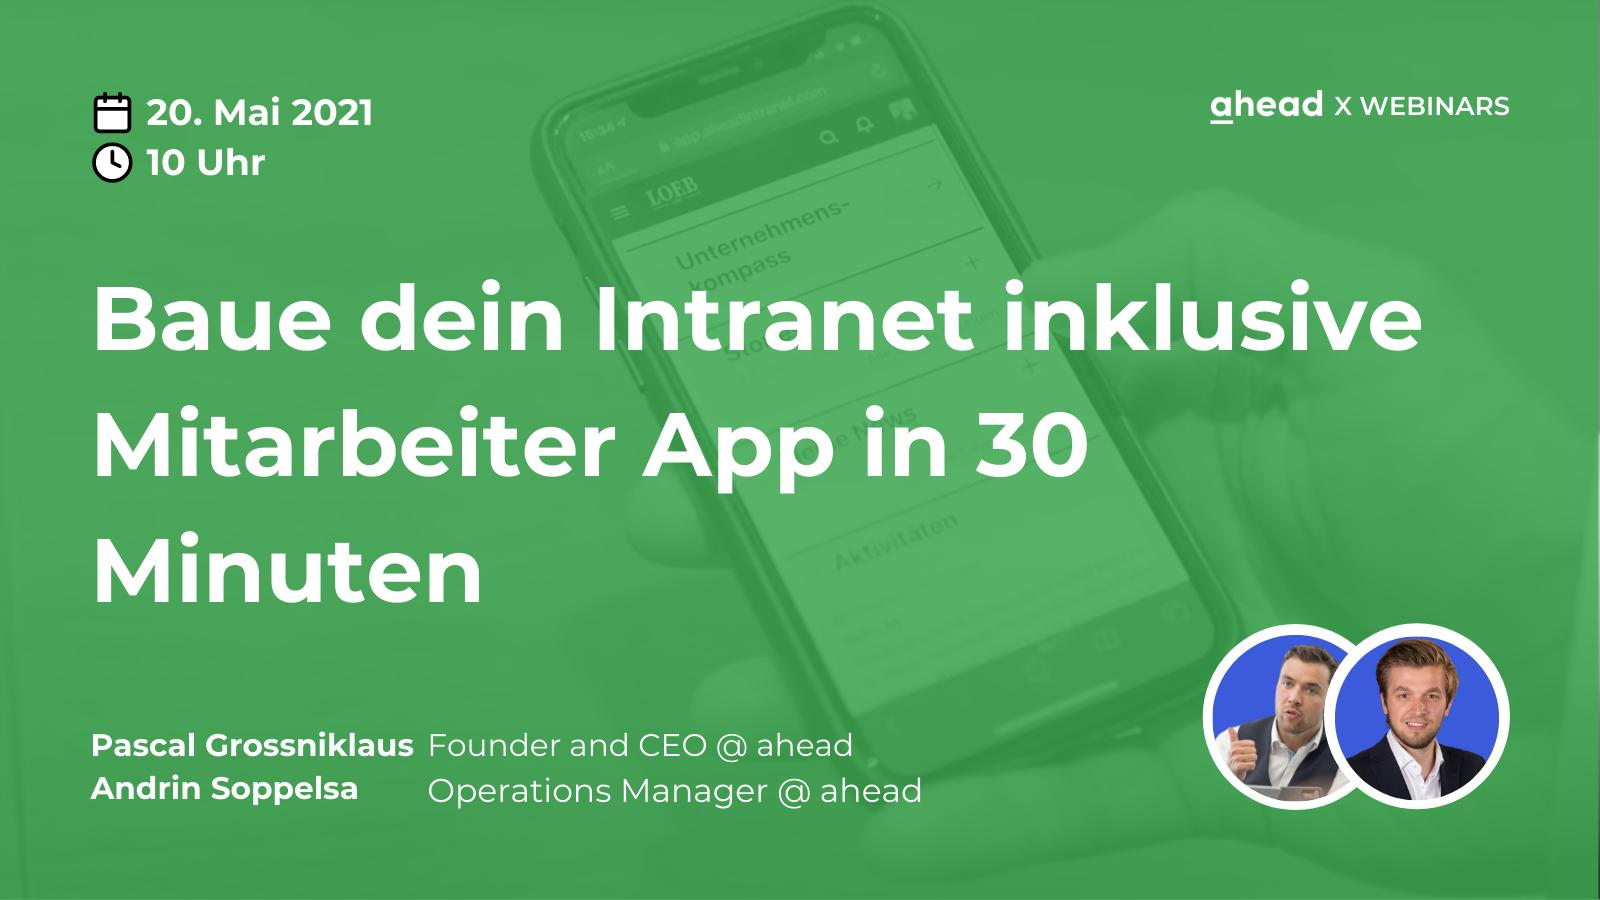 ahead Intranet Internal Communication Webinar Pascal Grossniklaus Andrin Soppelsa Employee App